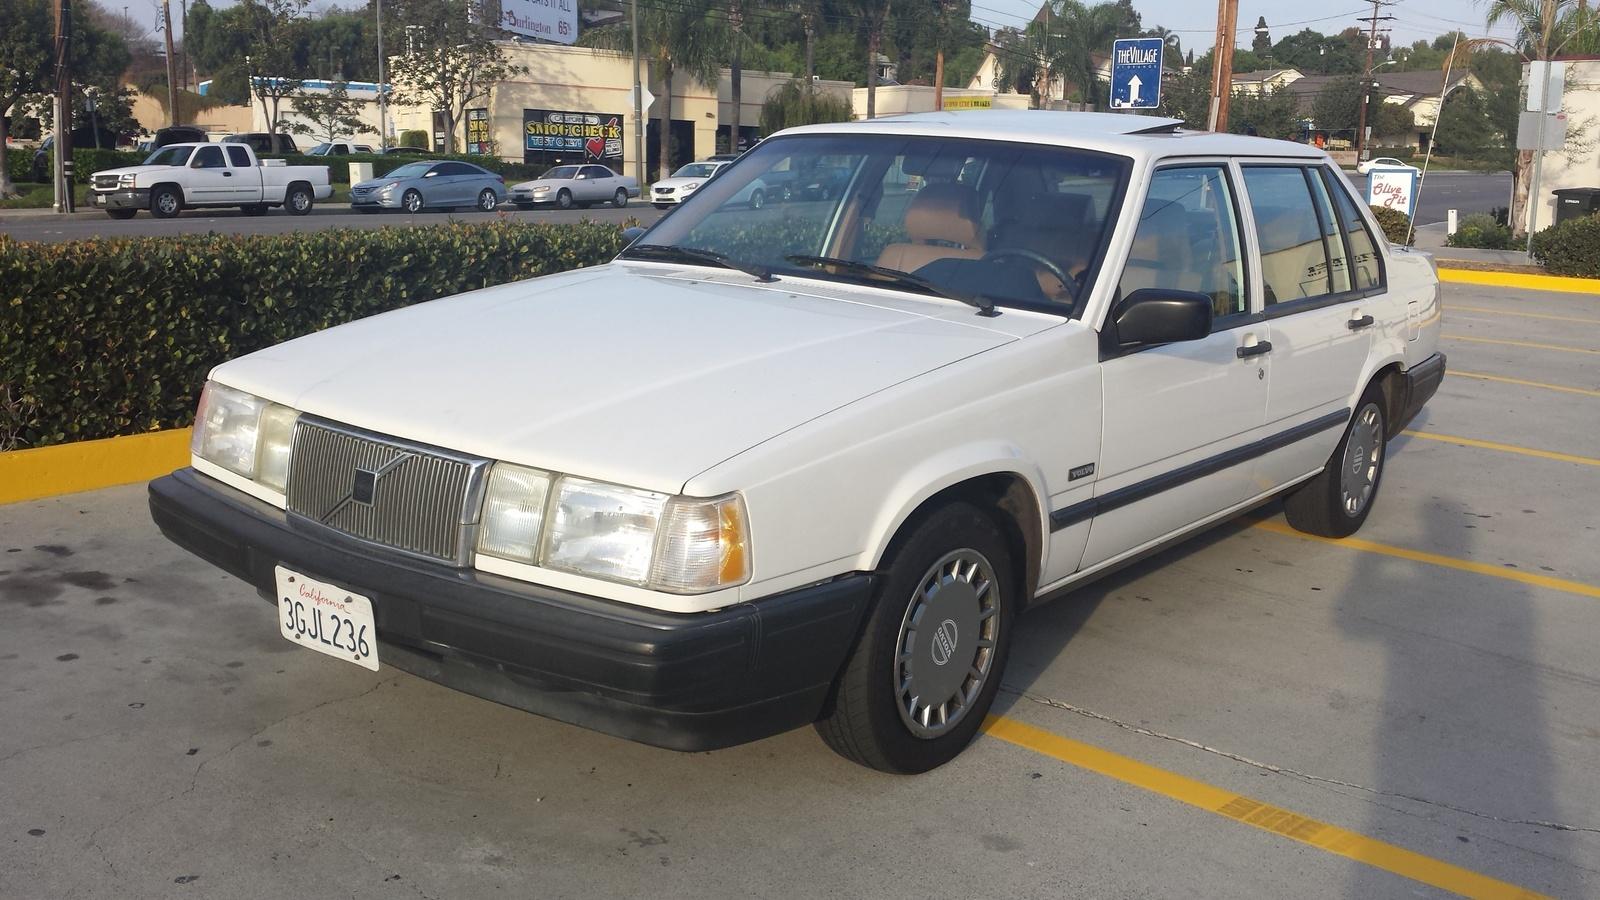 1991 volvo 940 turbo wagon  1991  free engine image for Volvo 850 Turbo Volvo 940 Turbo Wagon